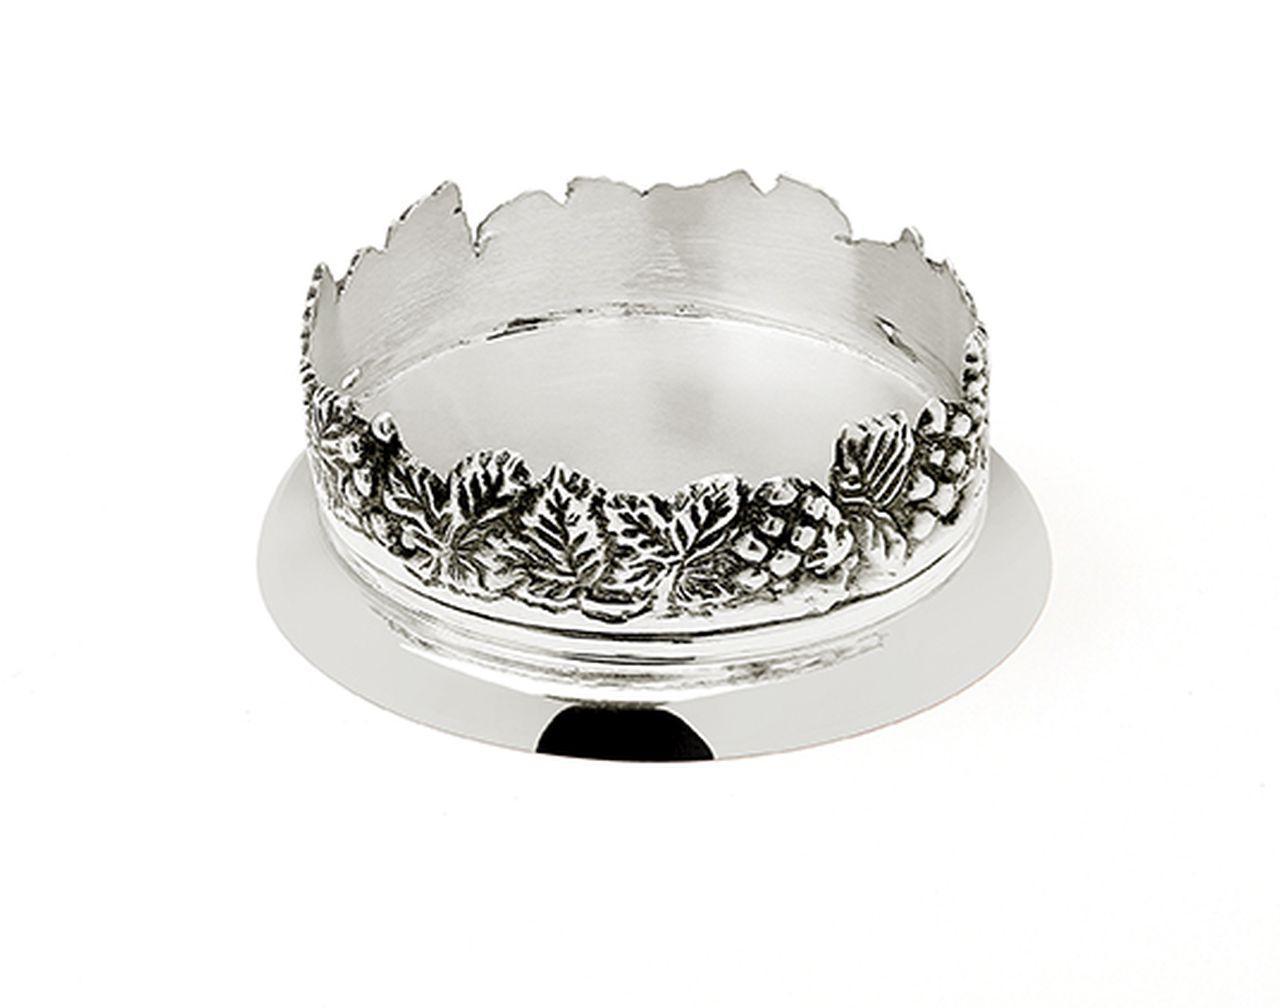 Sottobottiglia argentato argento sheffield stile grappe cm.4h diam.14